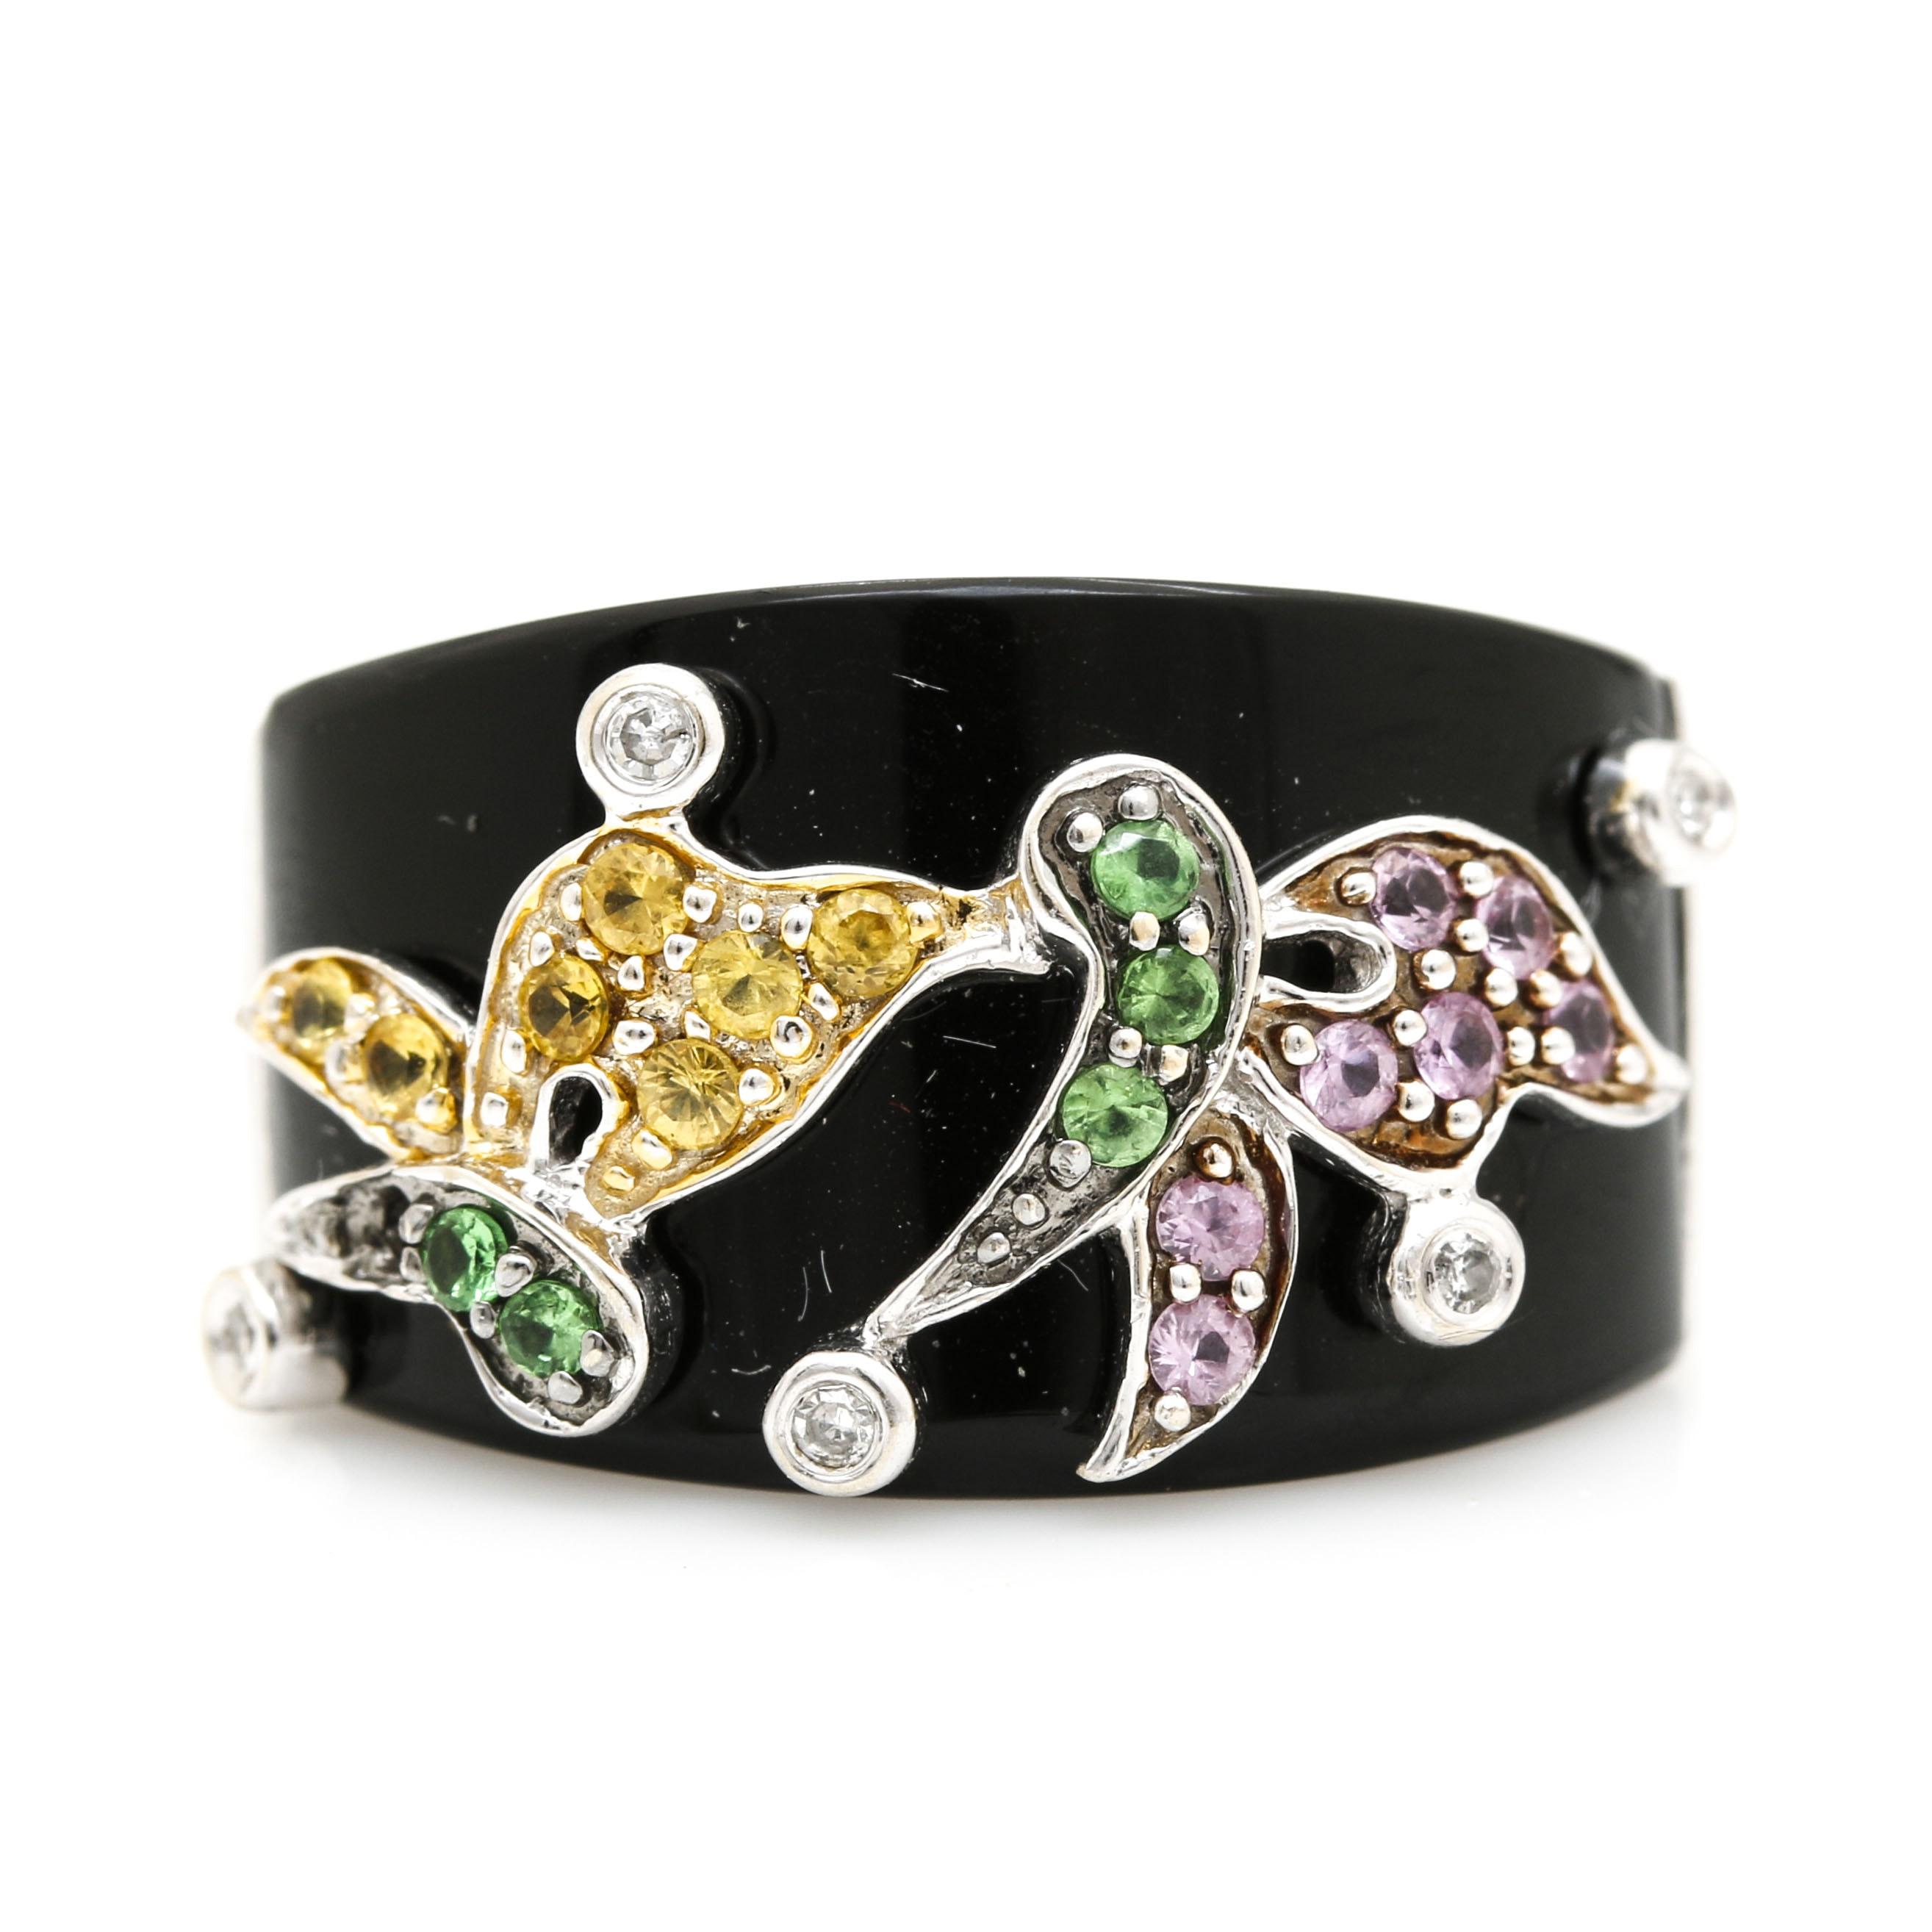 14K White Gold Gemstone Floral Ring